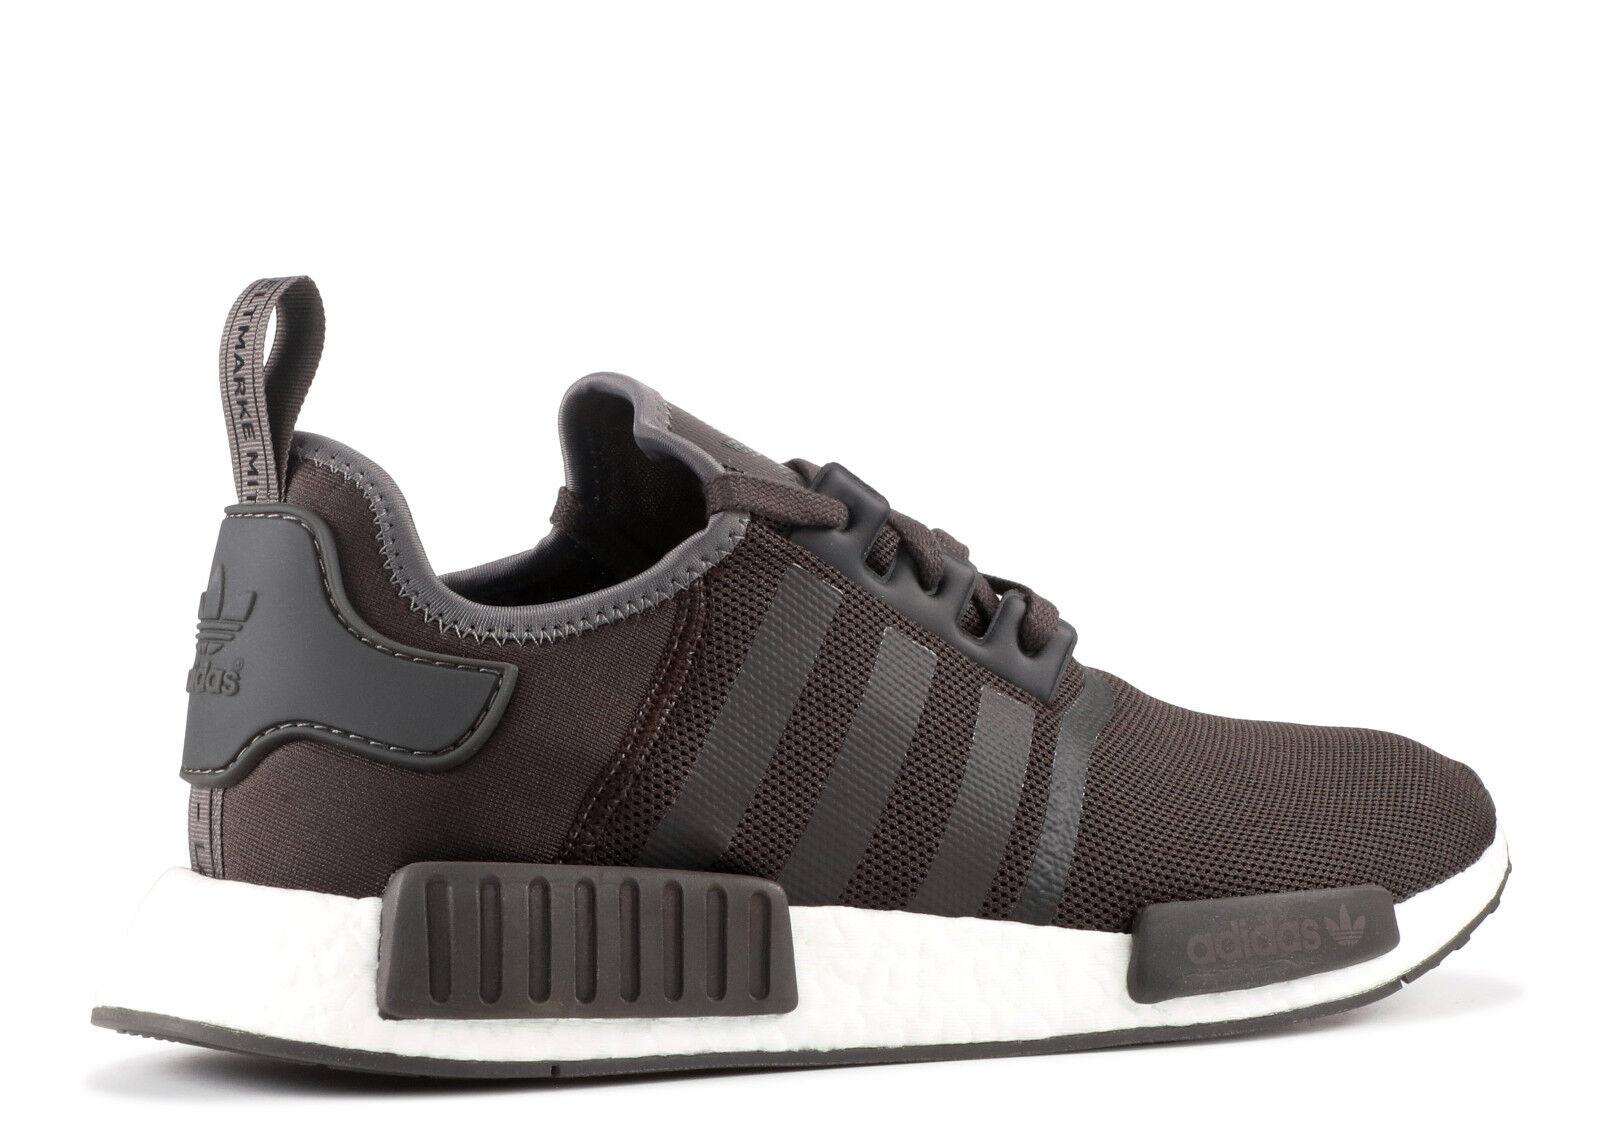 Adidas nmd r1 mesh dunklen grau - weiße schwarz - weiße - größe 11.cq2412 yeezy ultra - impuls - pk a6e7d2